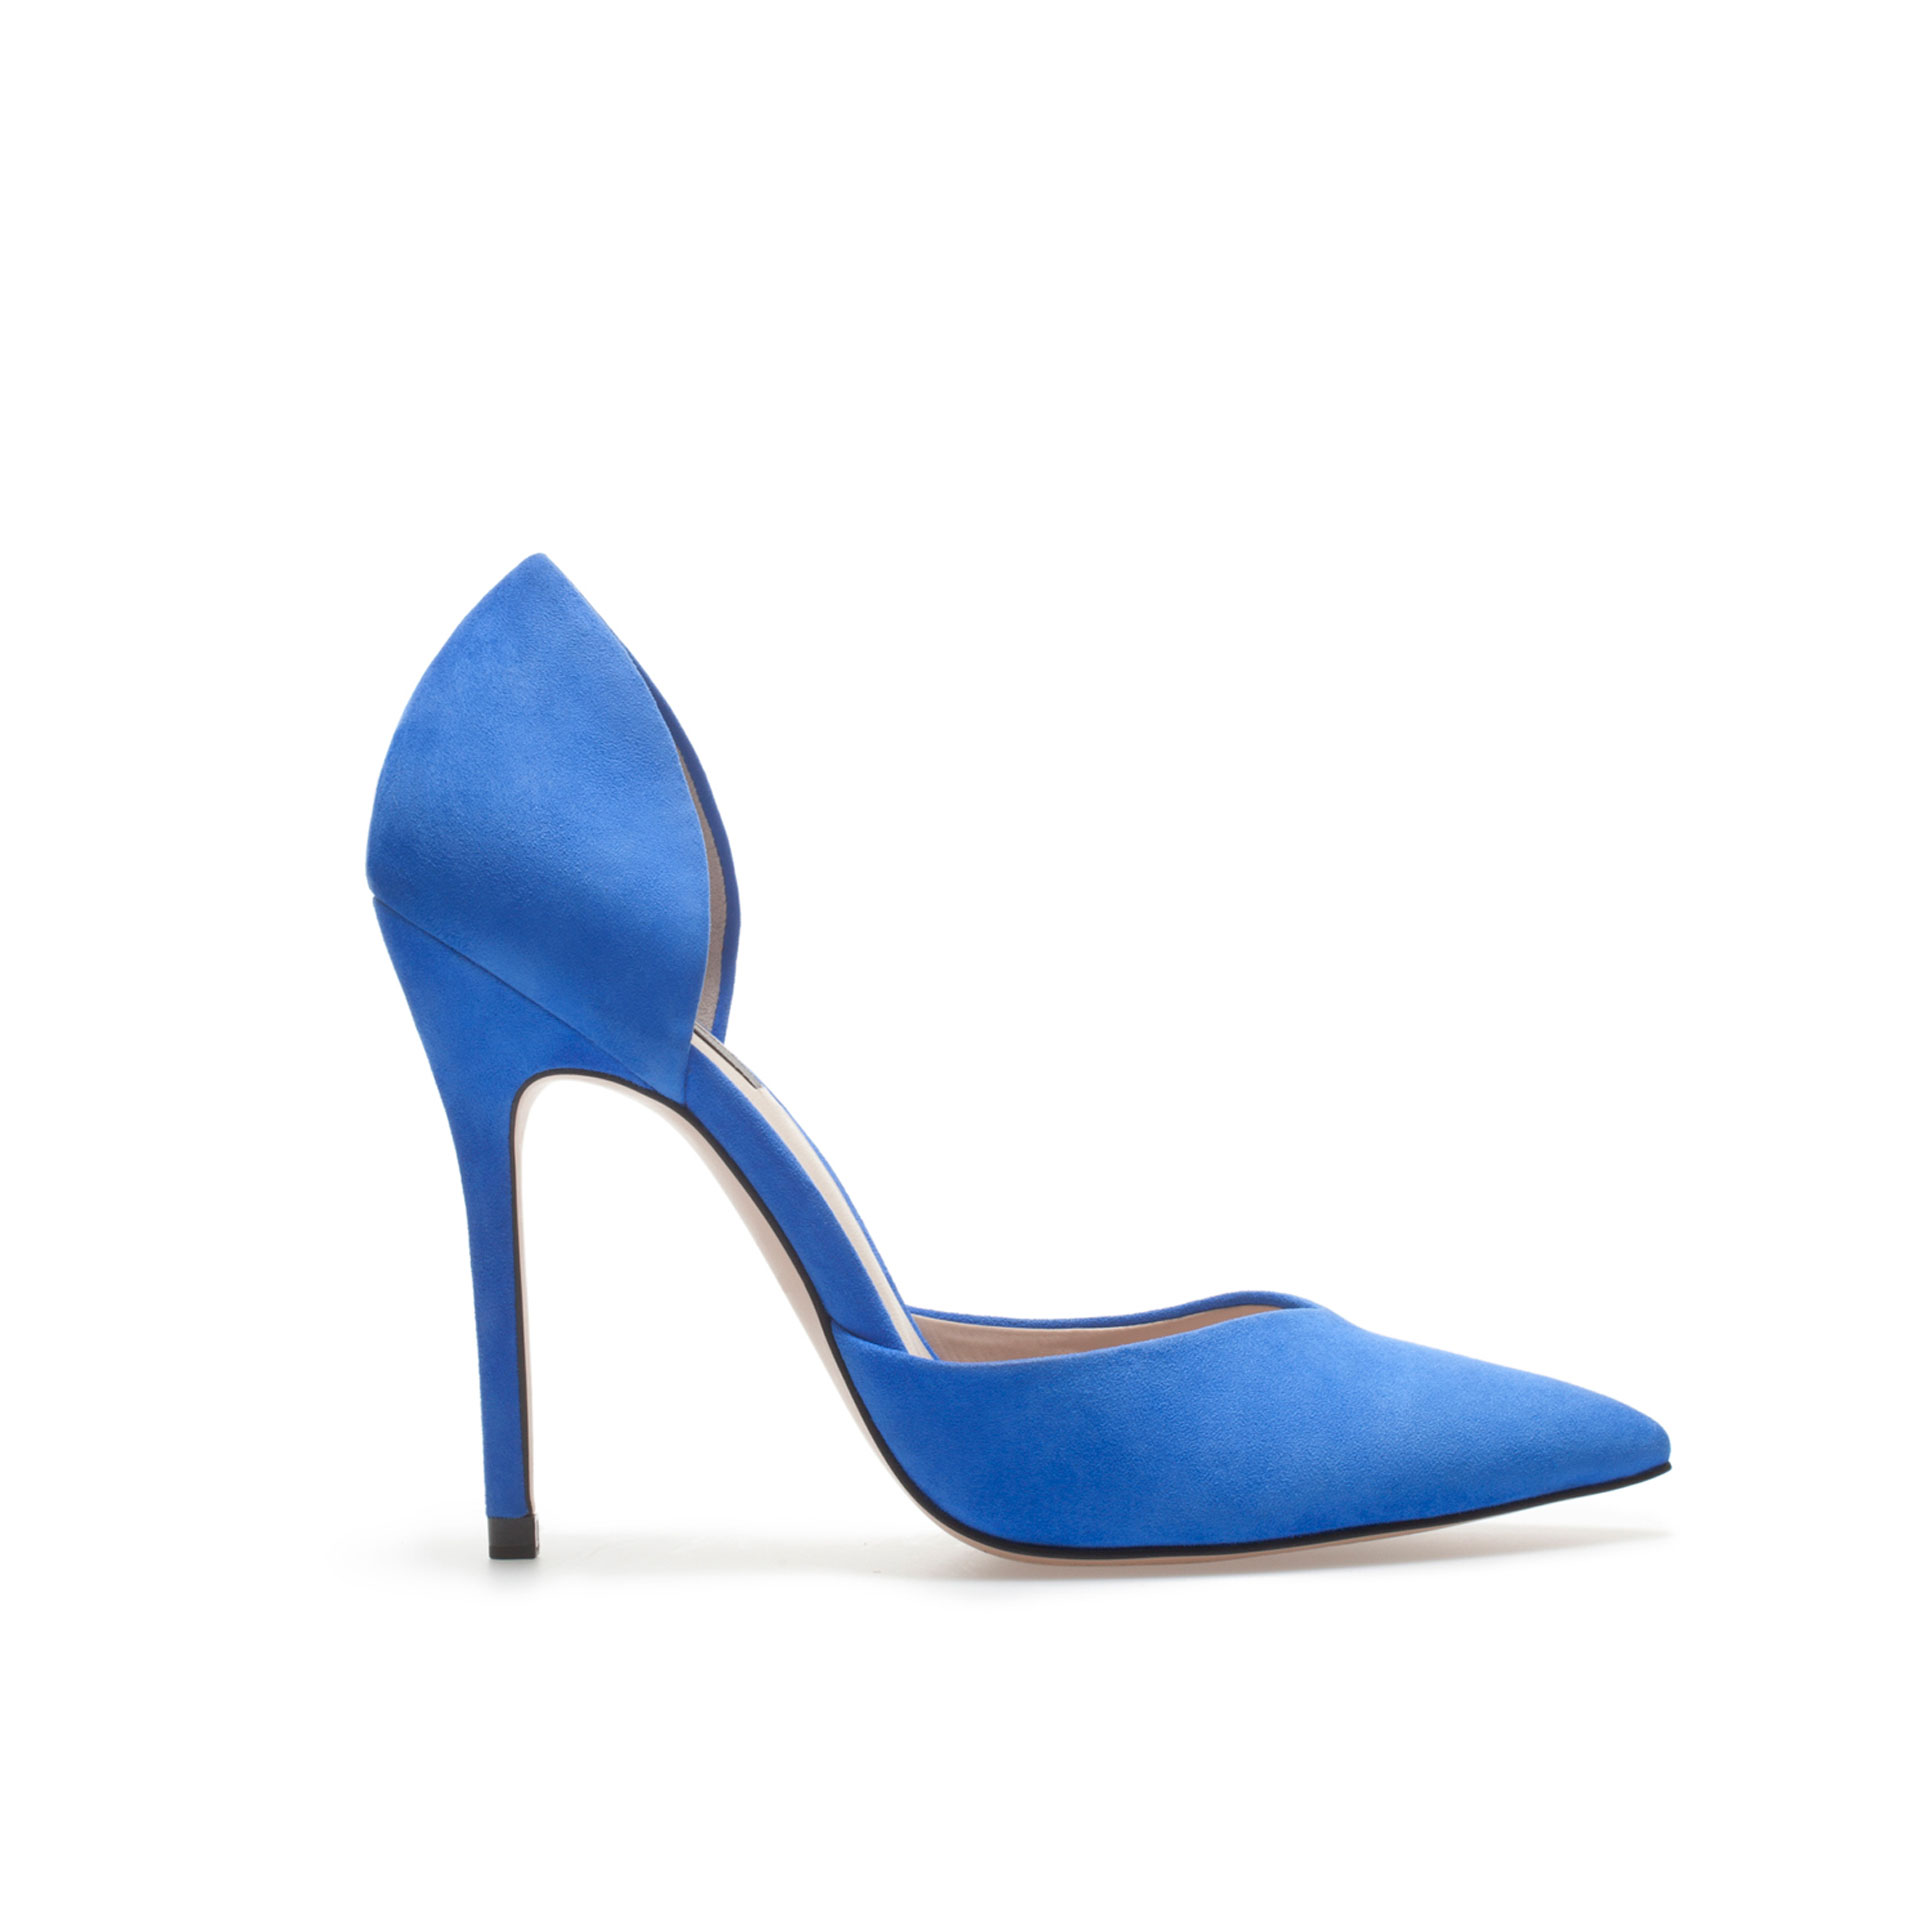 Zara Womens Sale Shoes